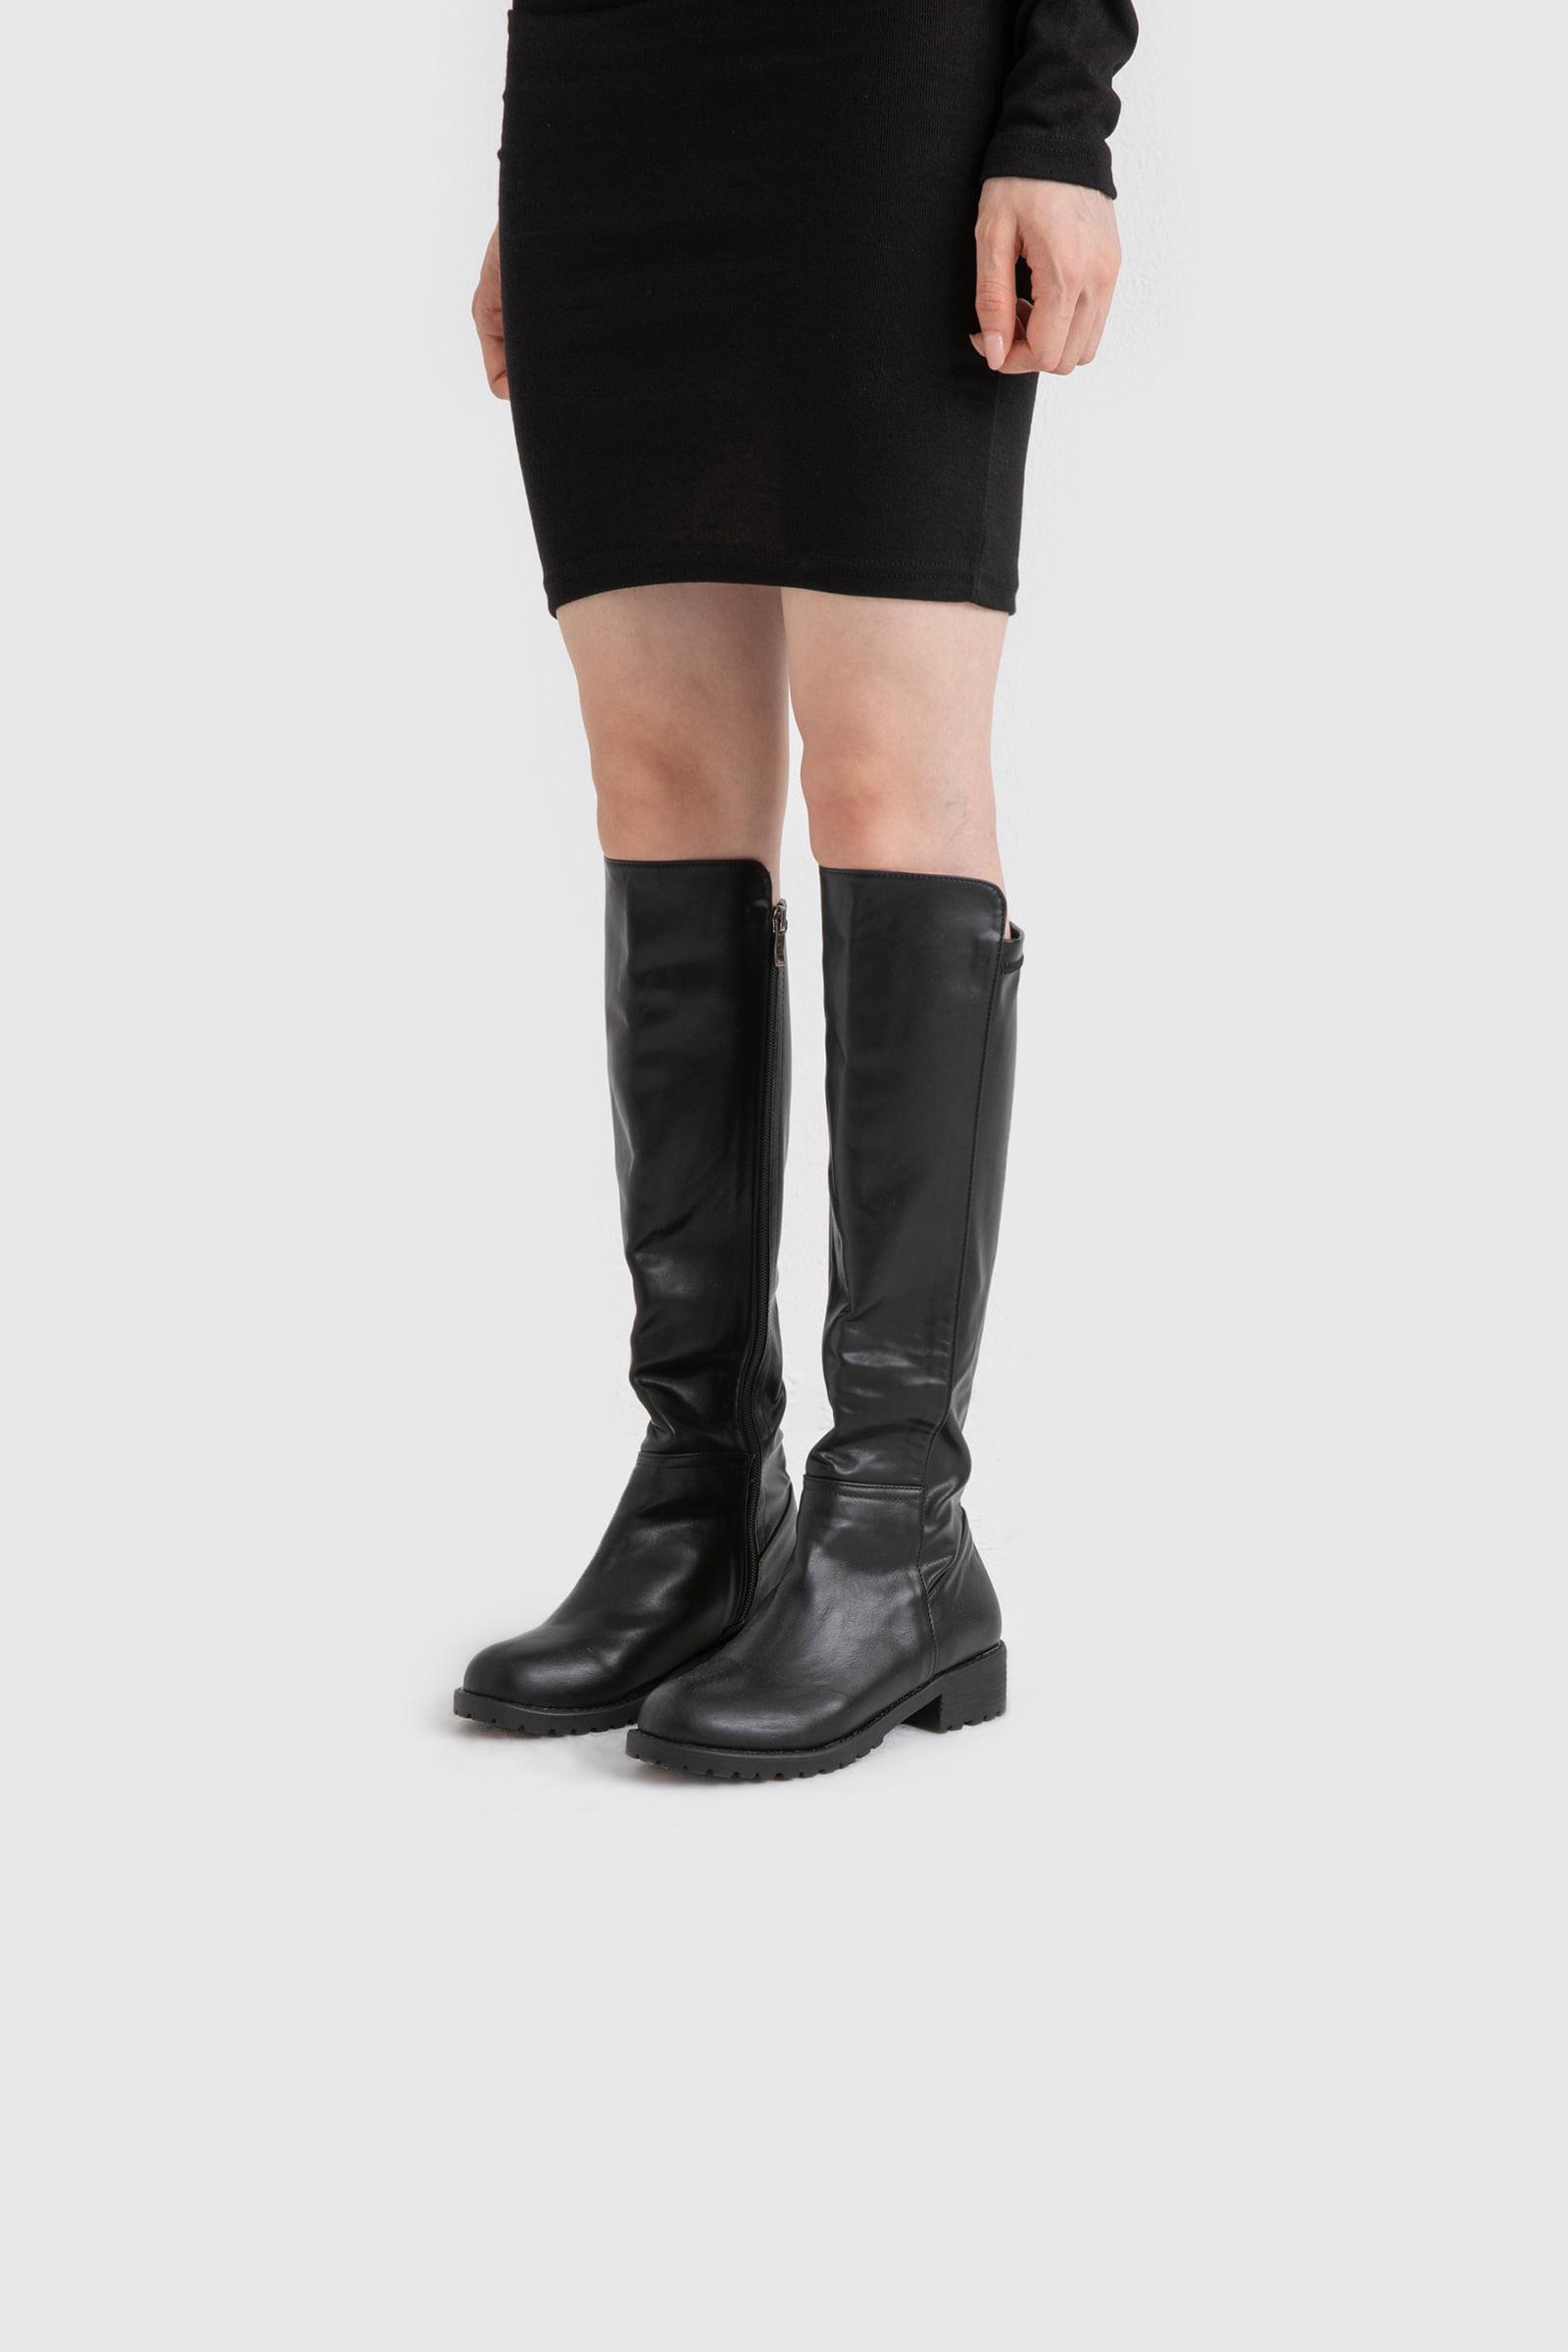 Unbalanced high long boots